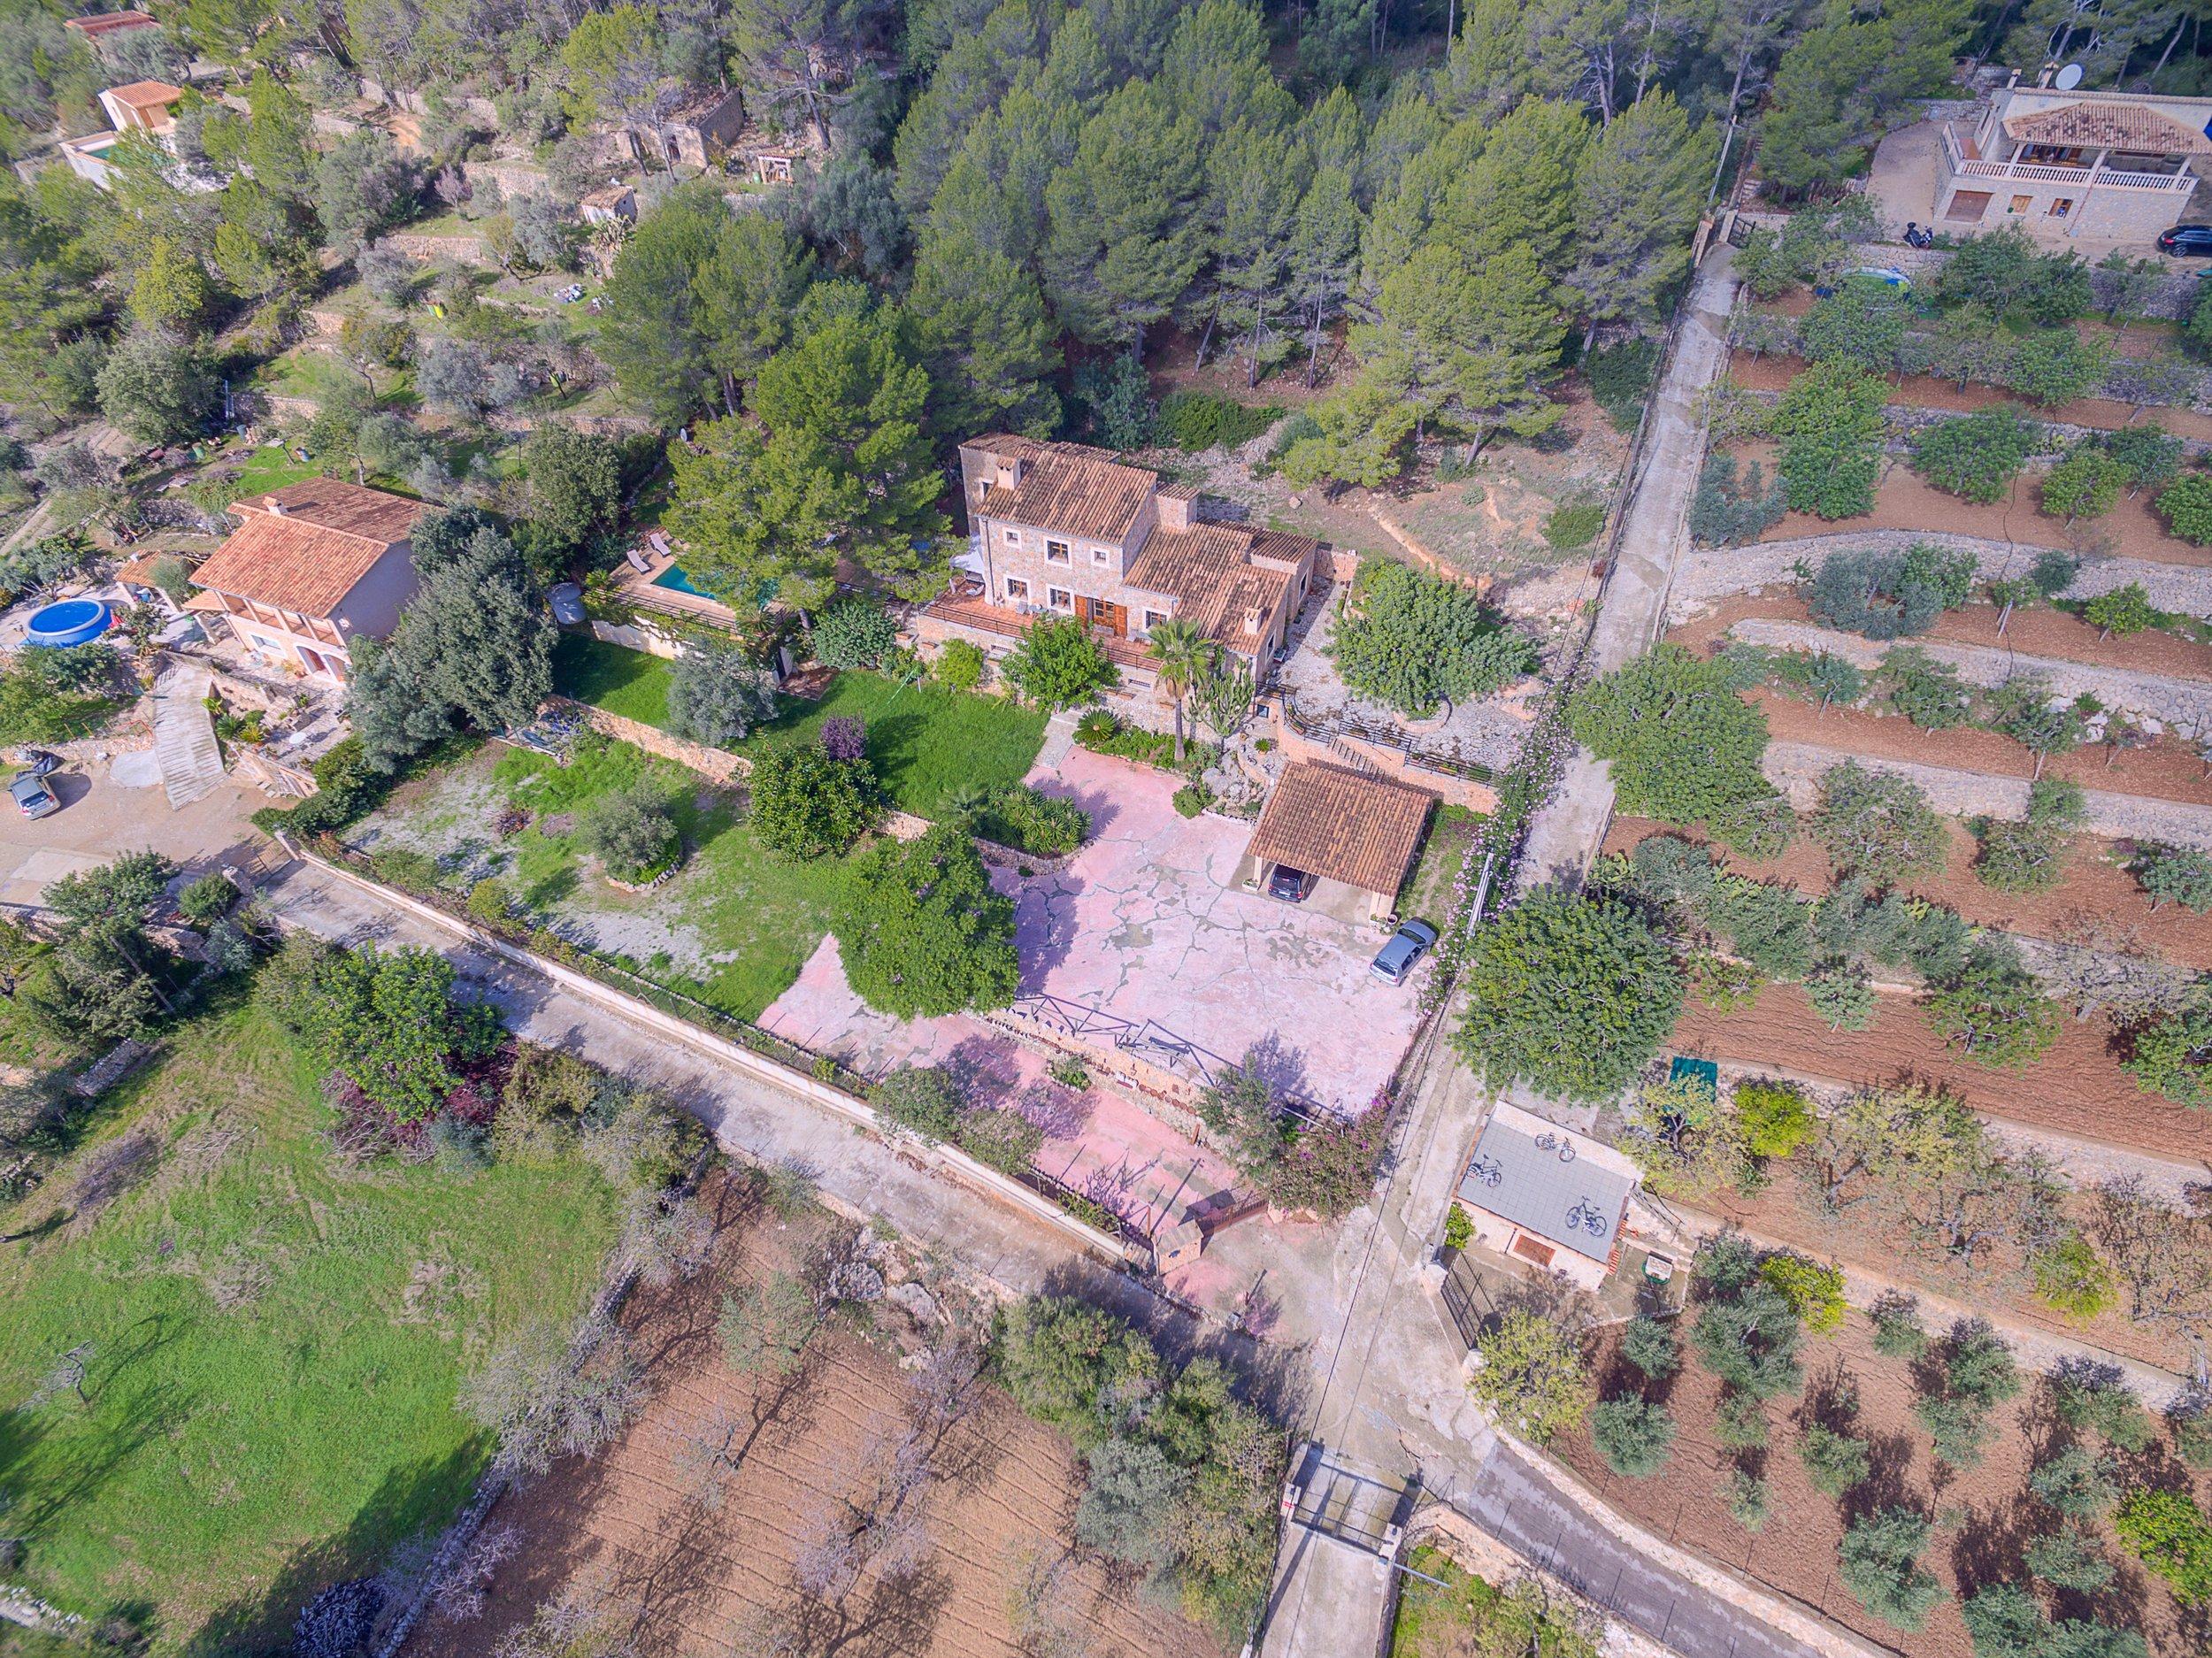 Maison de vacances Villa Cirera in Alaro (2611793), Alaro, Majorque, Iles Baléares, Espagne, image 30